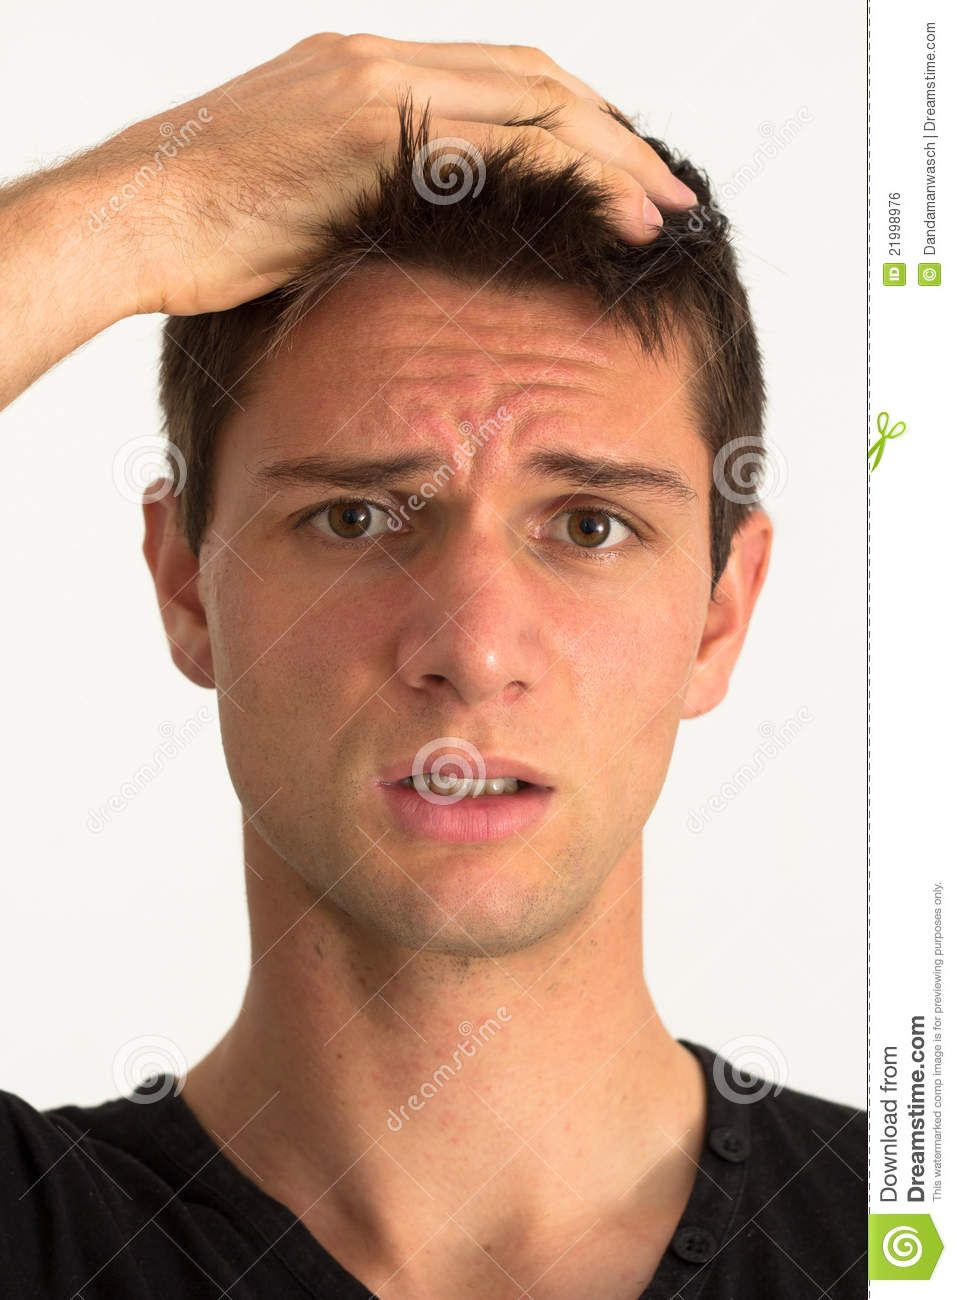 Pin On Facial Expression